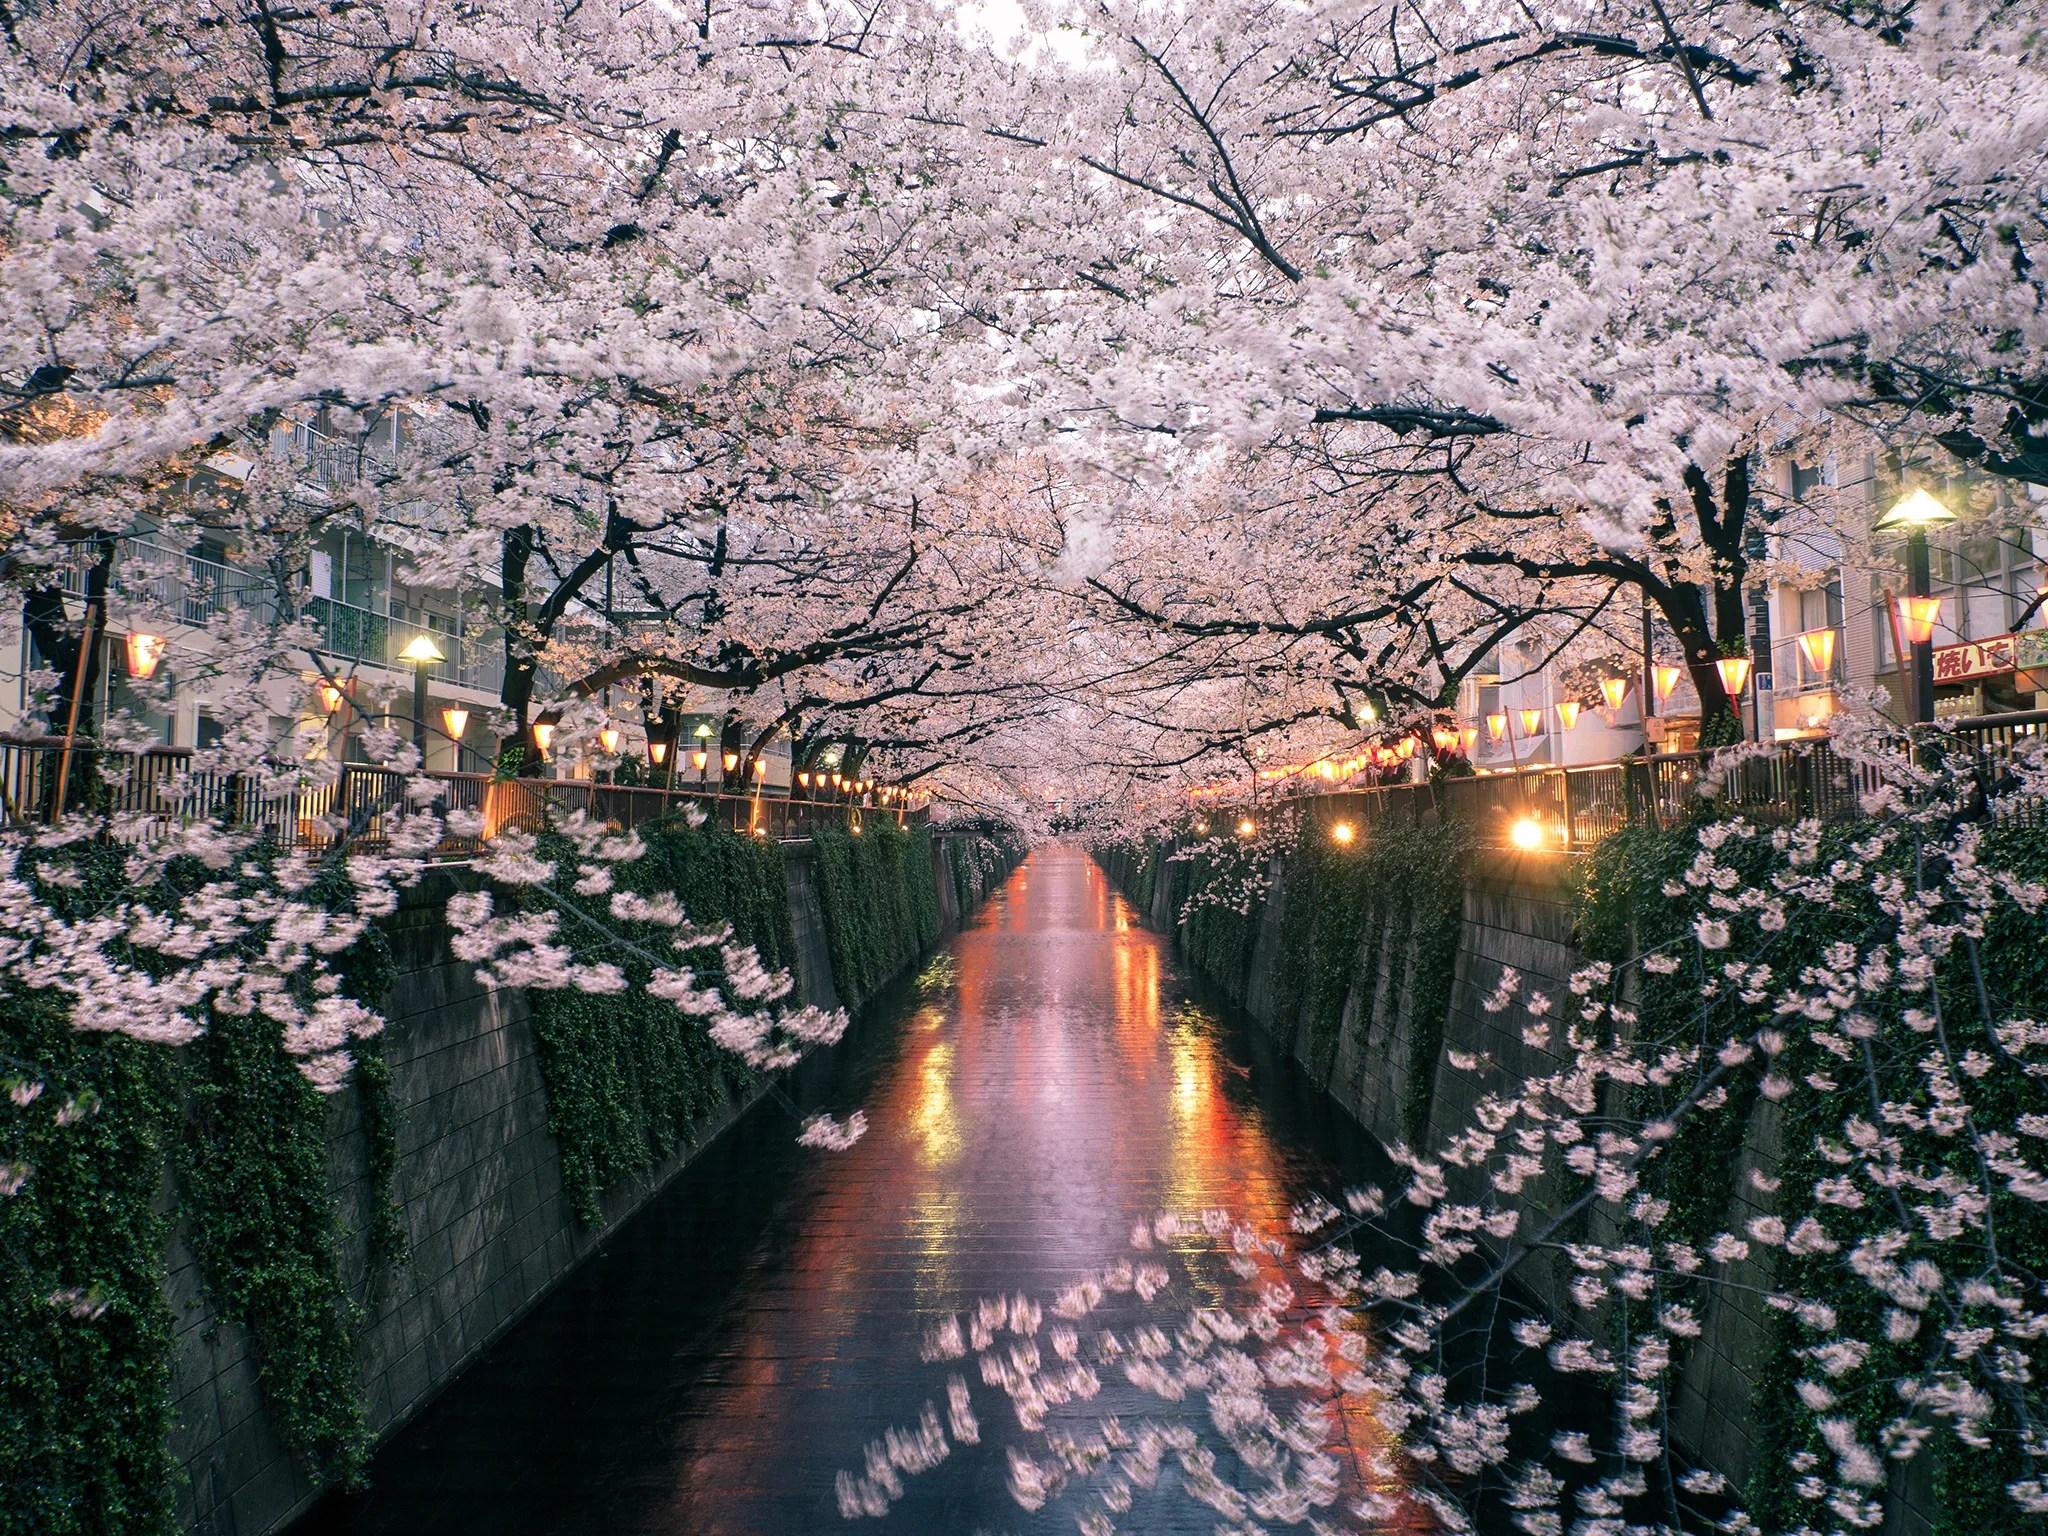 Cute Japanese Art 4k Wallpaper The Best Tokyo Neighborhood For Seeing Japan S Cherry